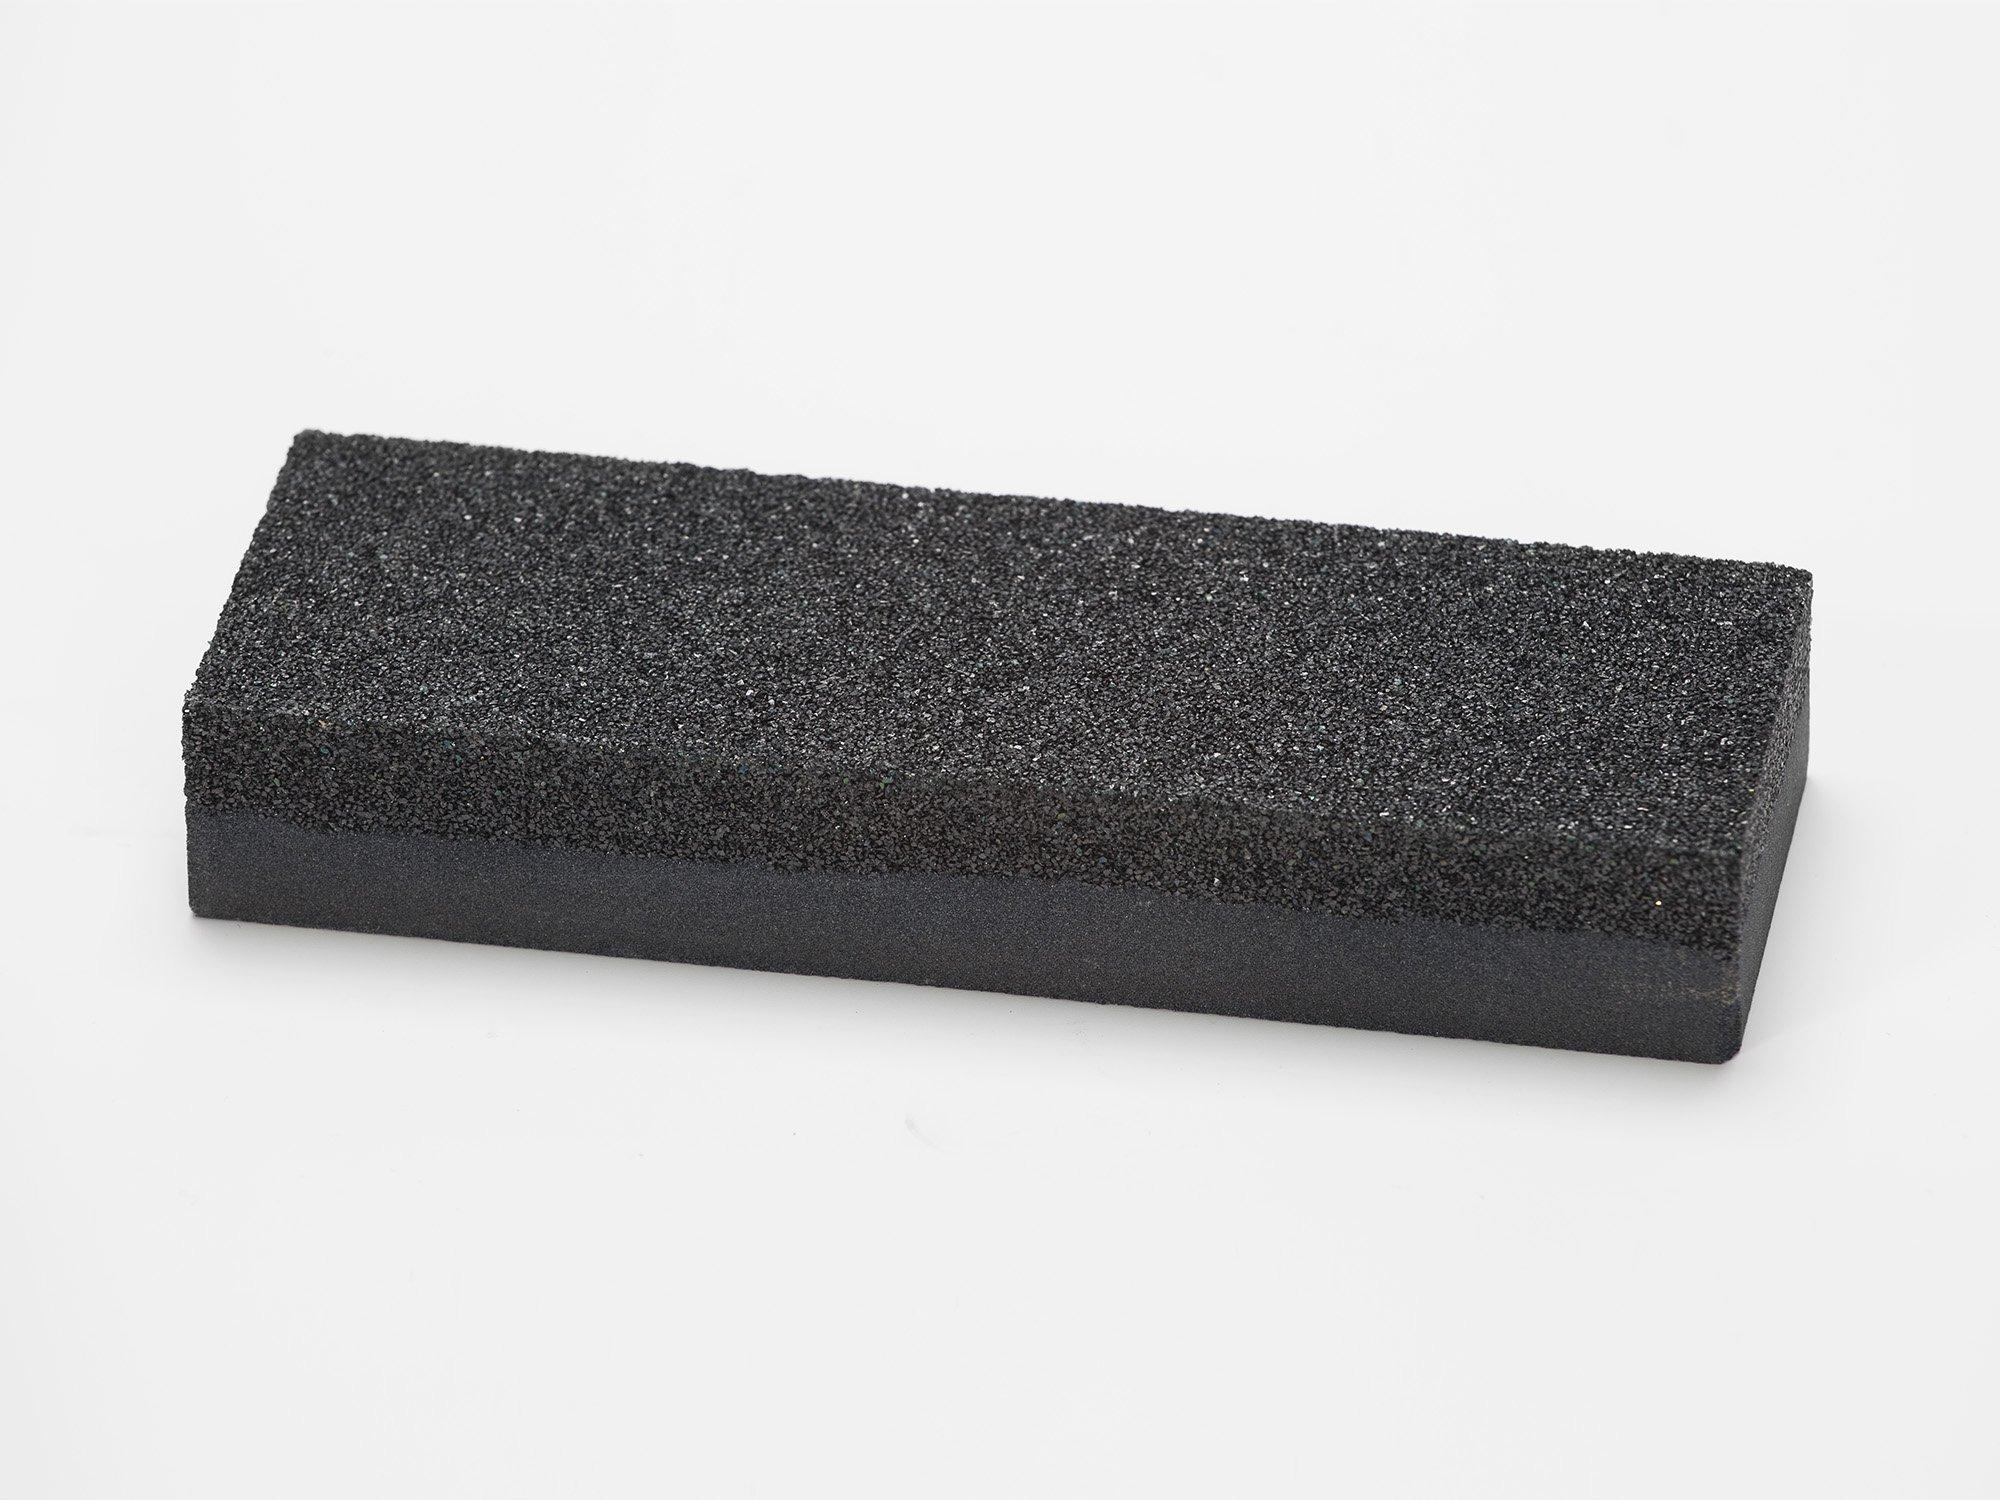 Tormek SP-650 Tormek Stone Grader